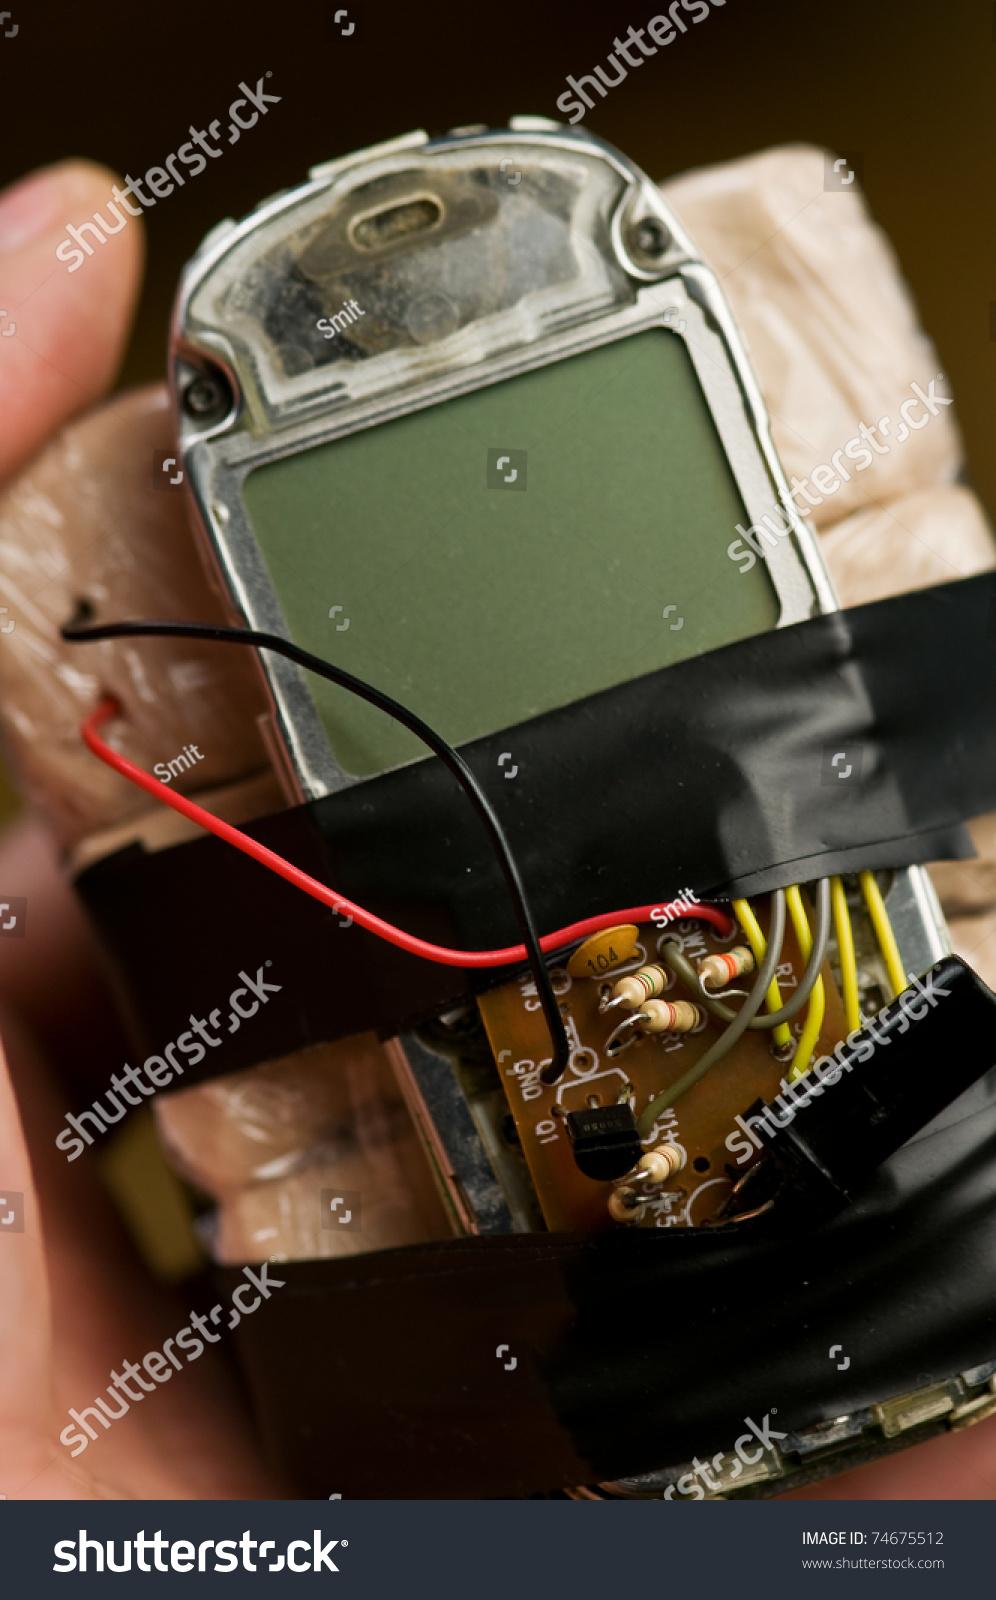 Homemade Bomb Mobile Phone Closeup Stock Photo Edit Now 74675512 Wwwhomemadeelectronicscom With